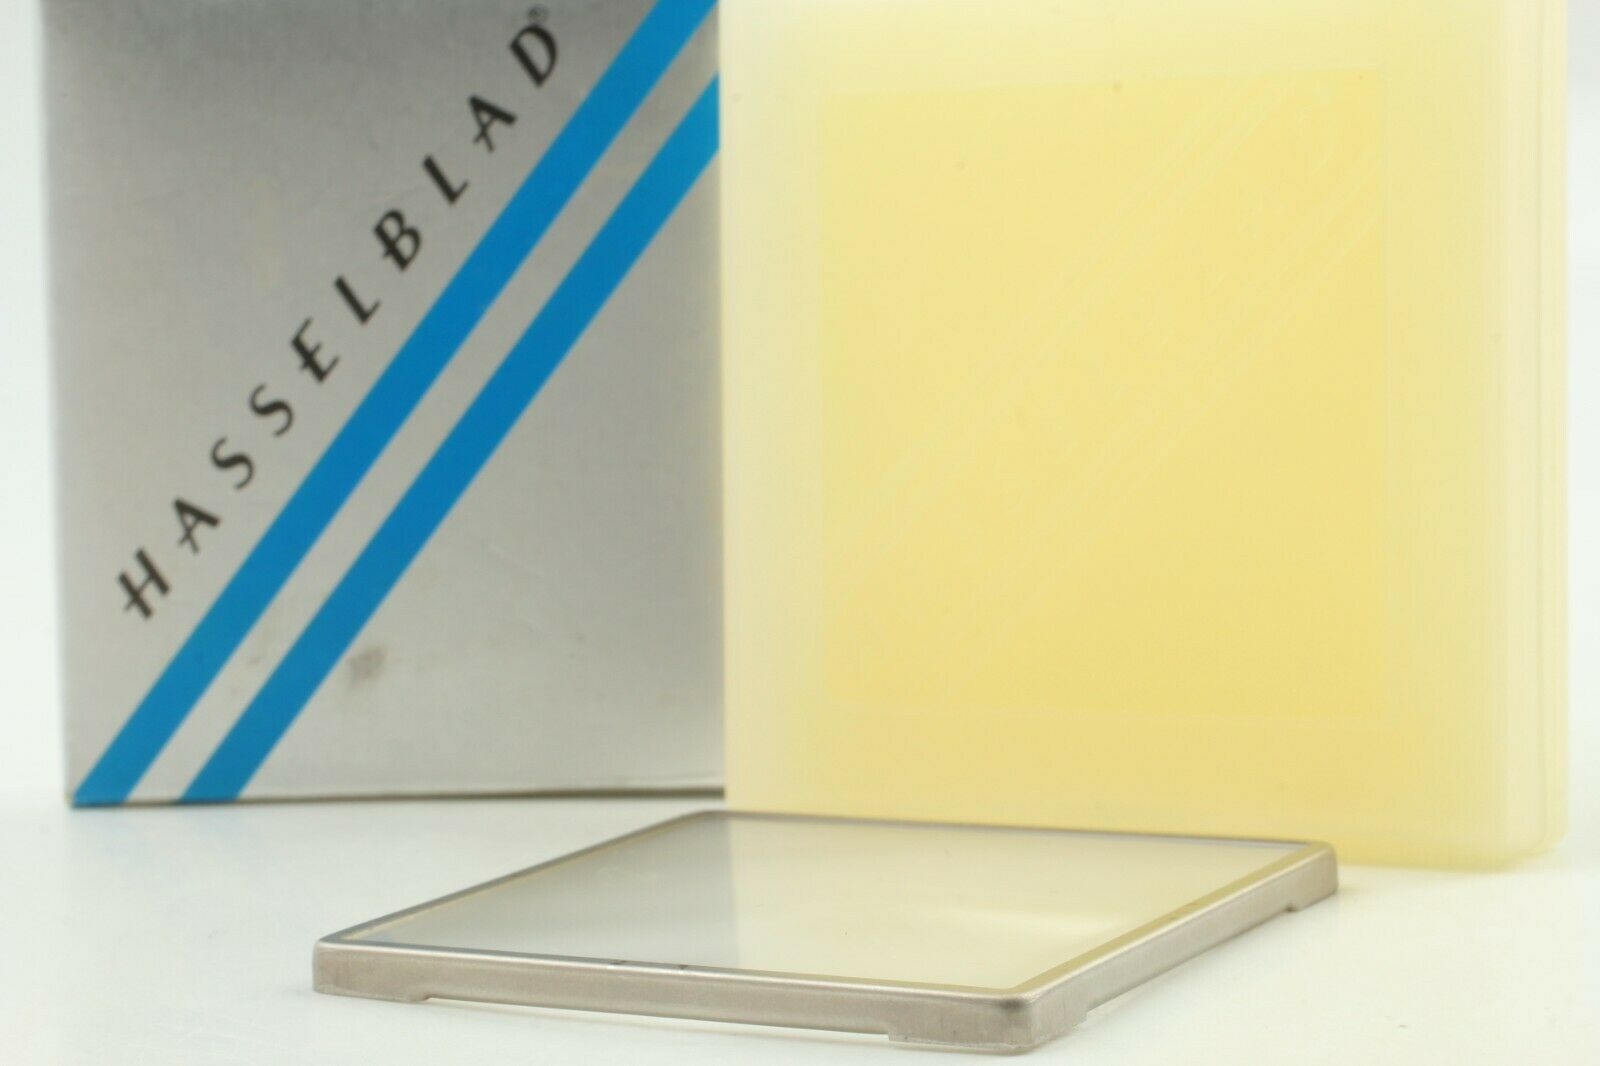 [Near MINT++] Hasselblad 42226 Focusing Bright Matte Screen from Japan #670-4